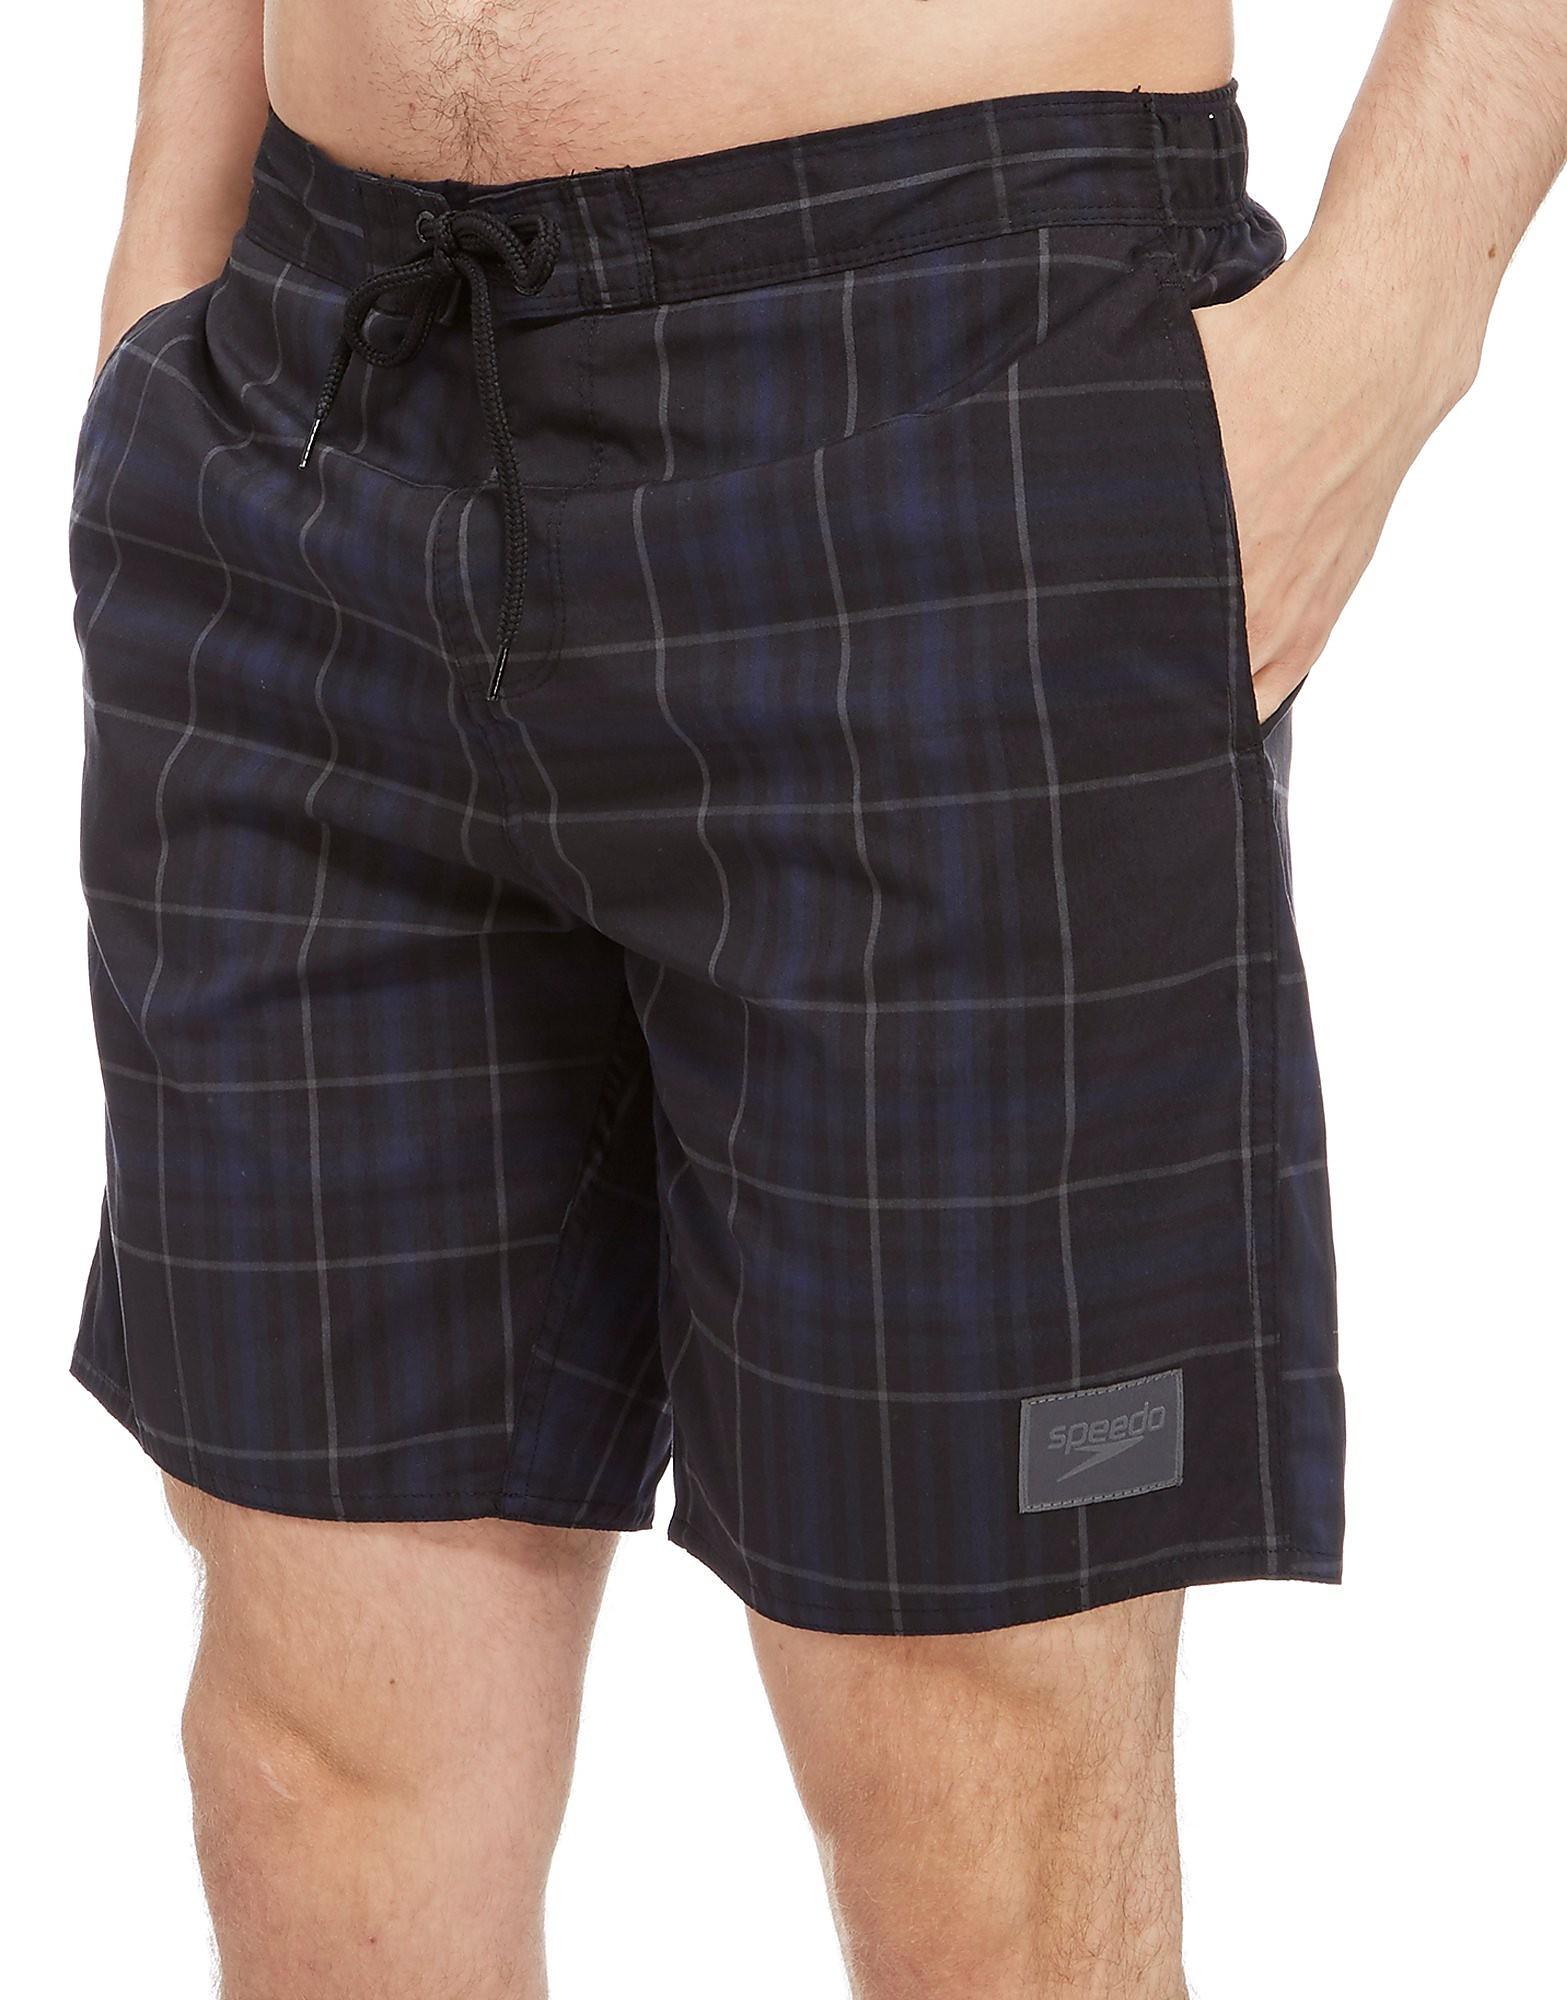 Speedo Check Leisure 18  Swim Shorts - Grey, Grey